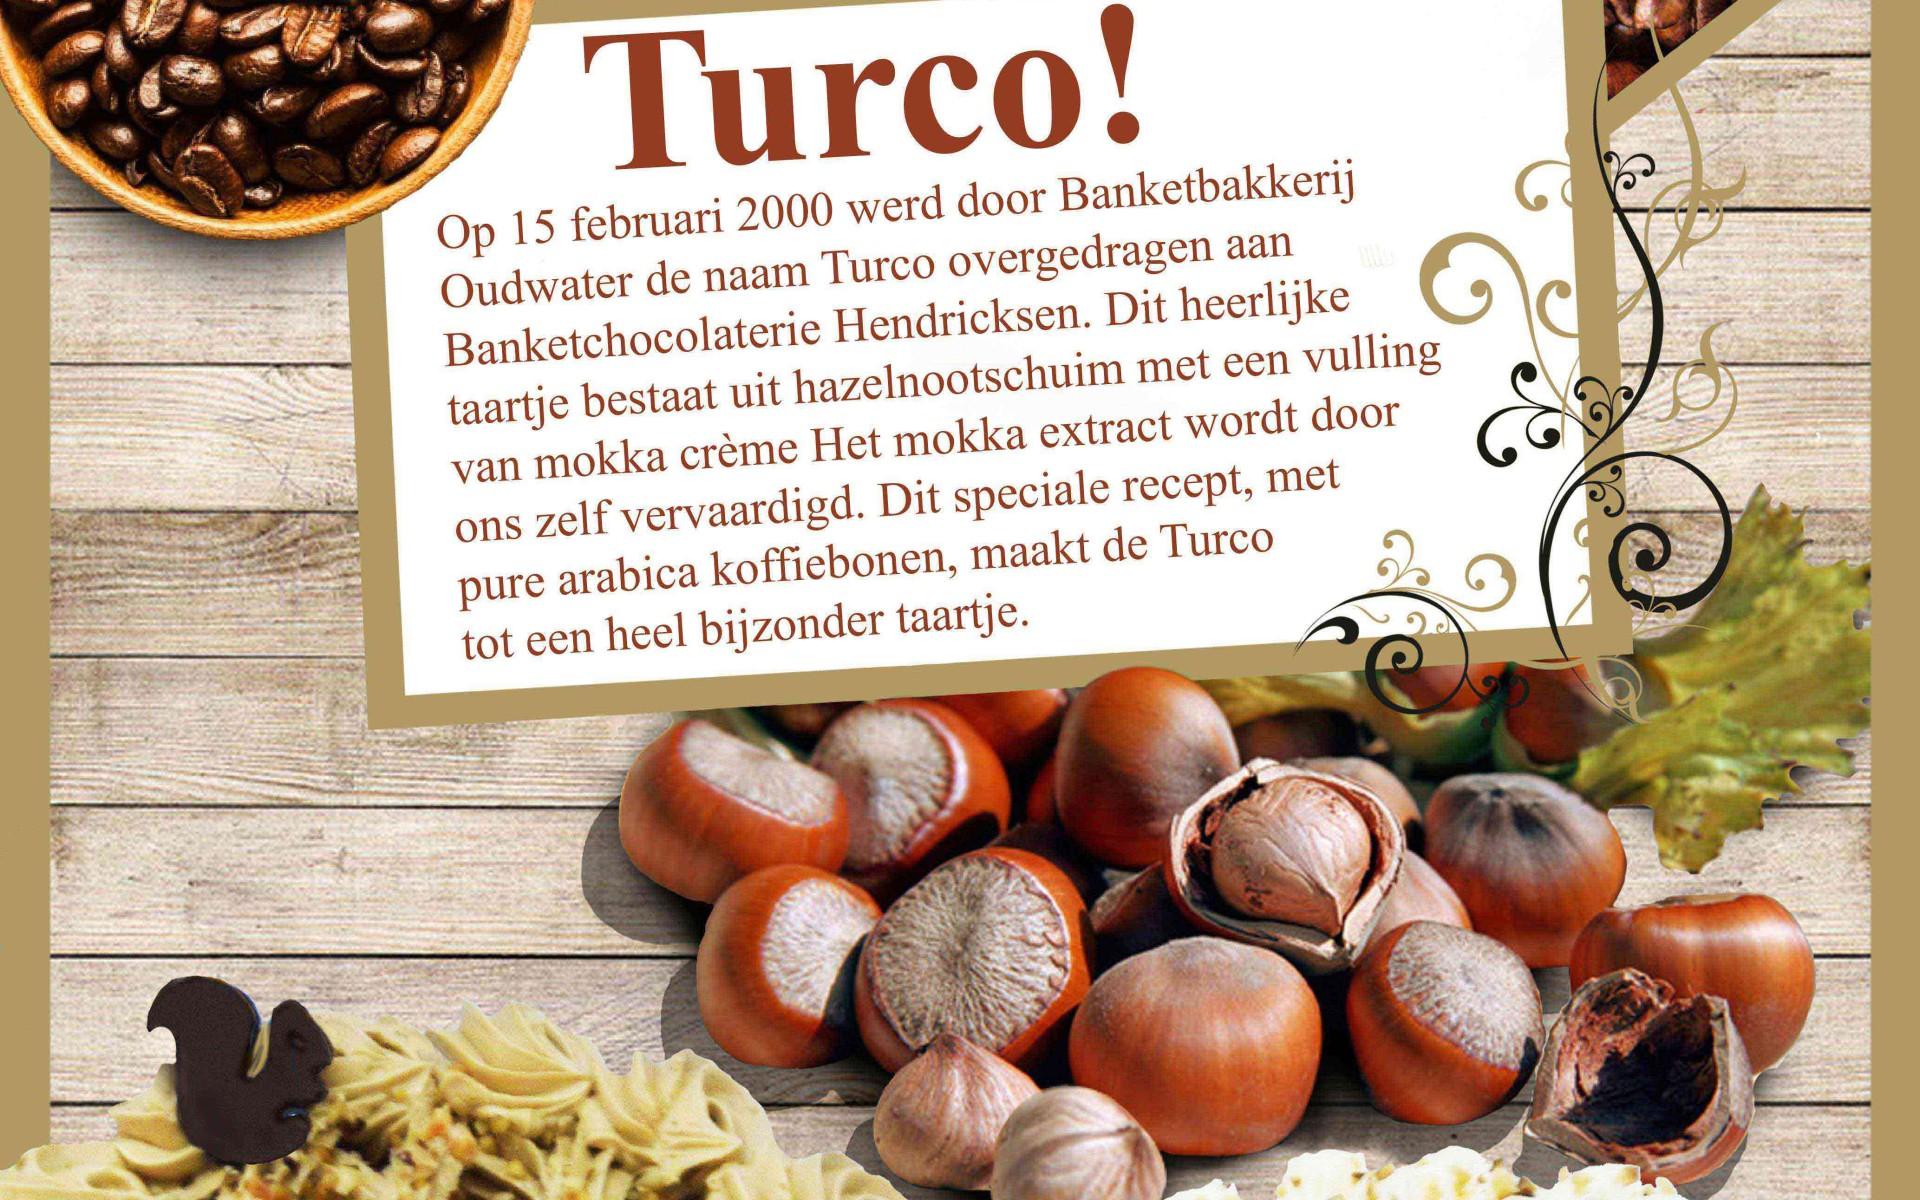 turco taart Turco   Banket Hendricksen turco taart